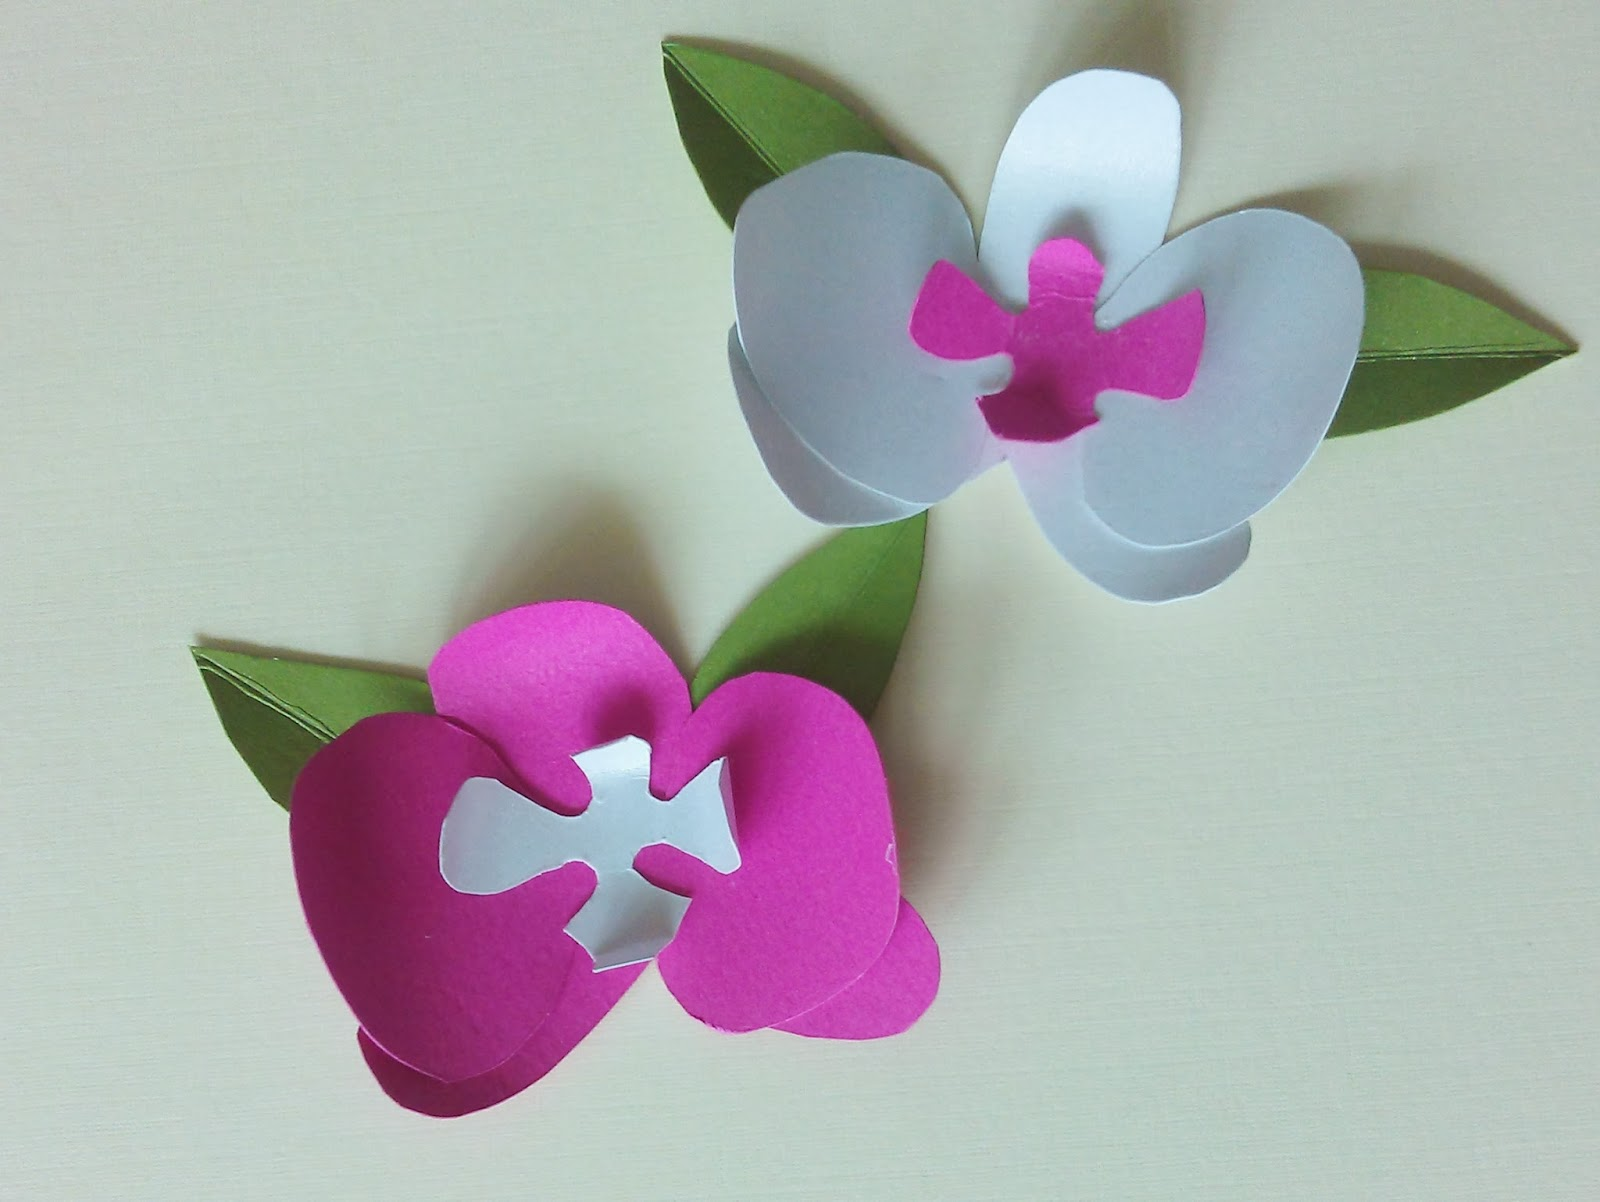 Origamikirigamipaper Artist And Designer In Singapore